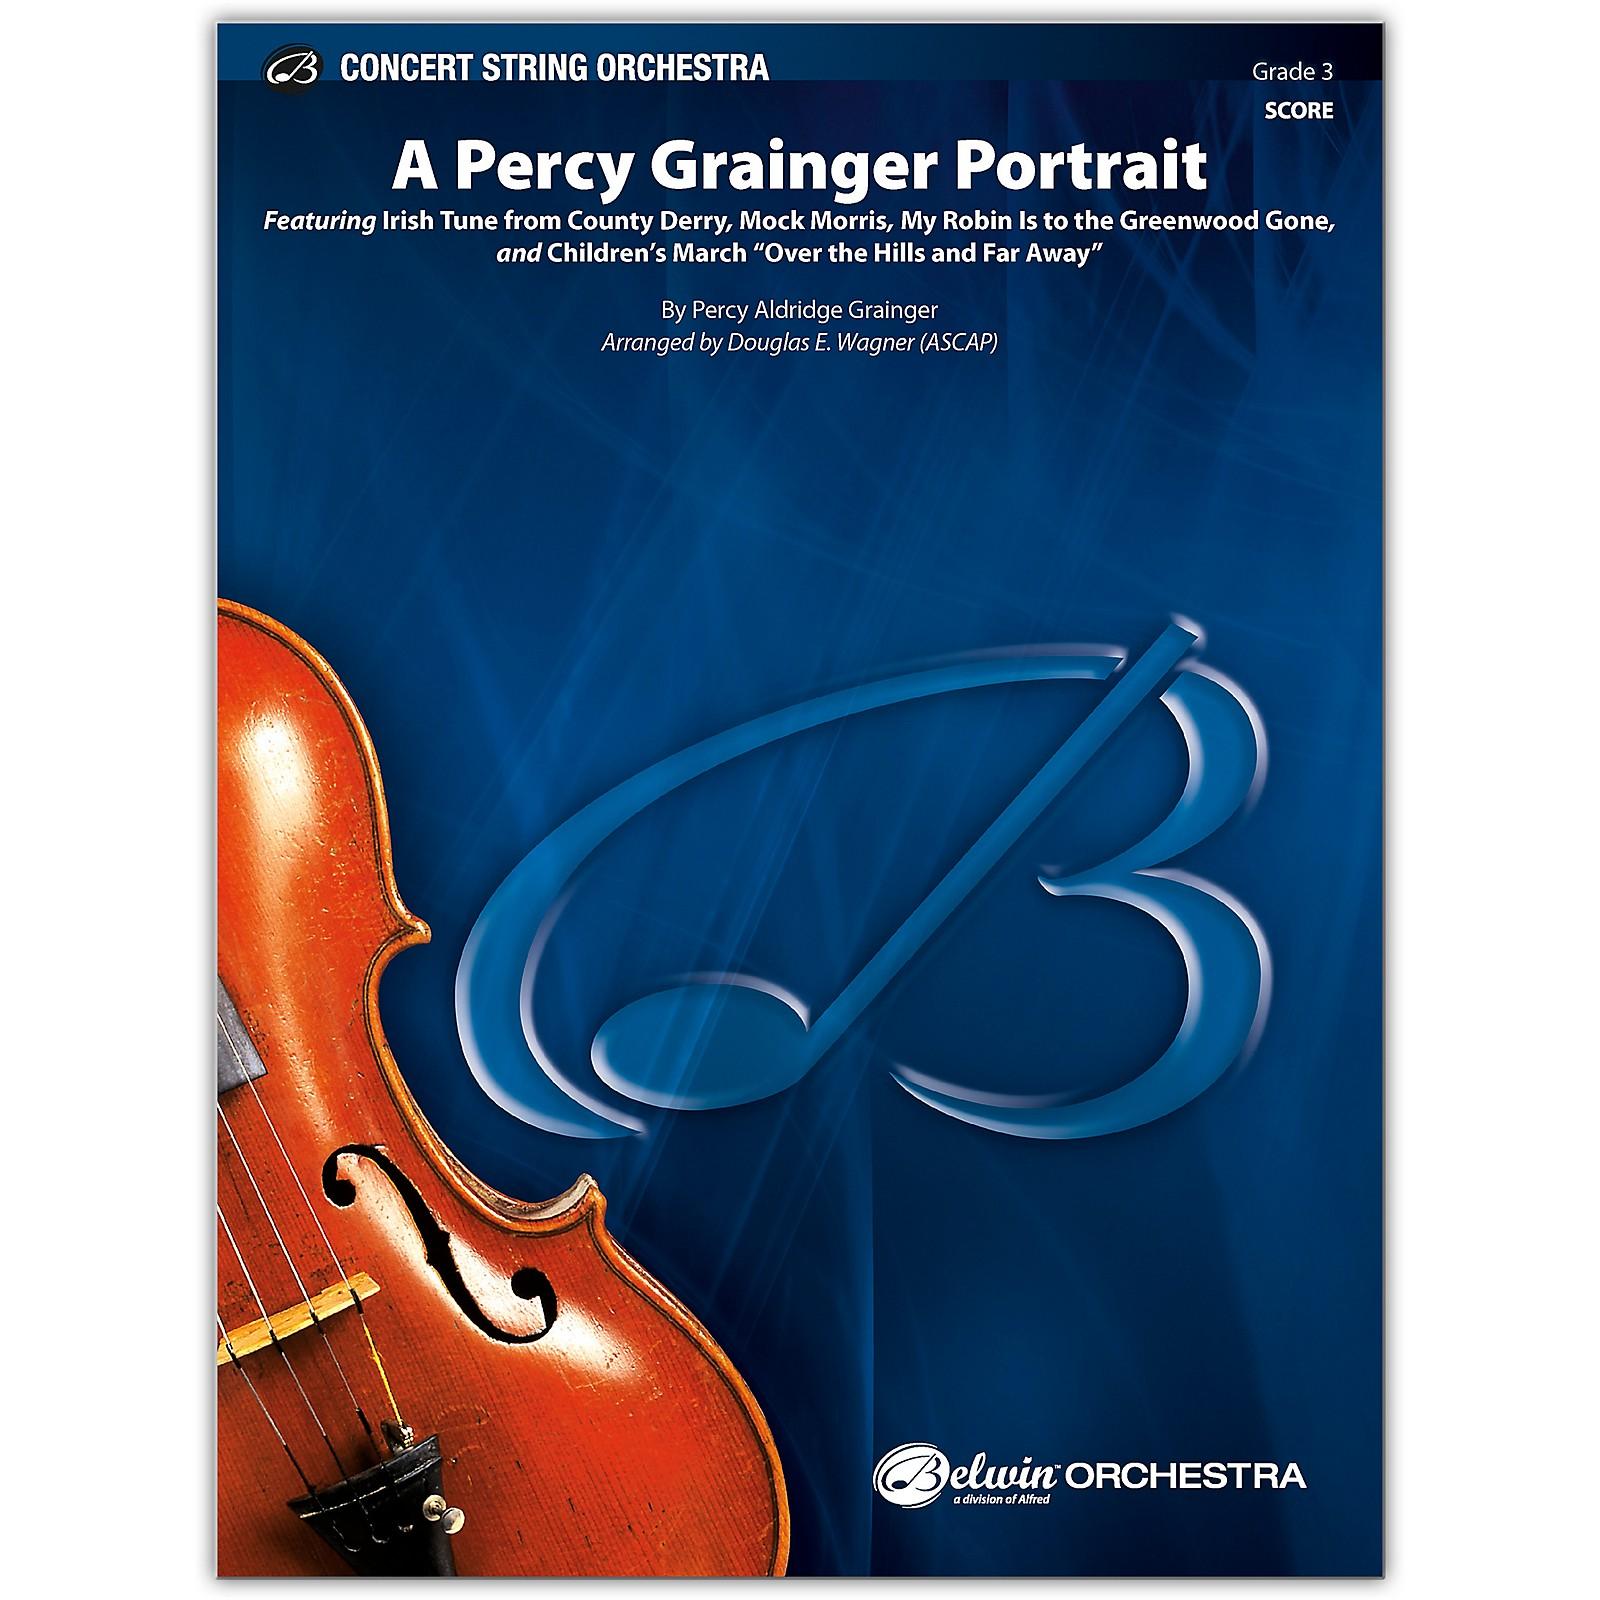 BELWIN A Percy Grainger Portrait Conductor Score 3